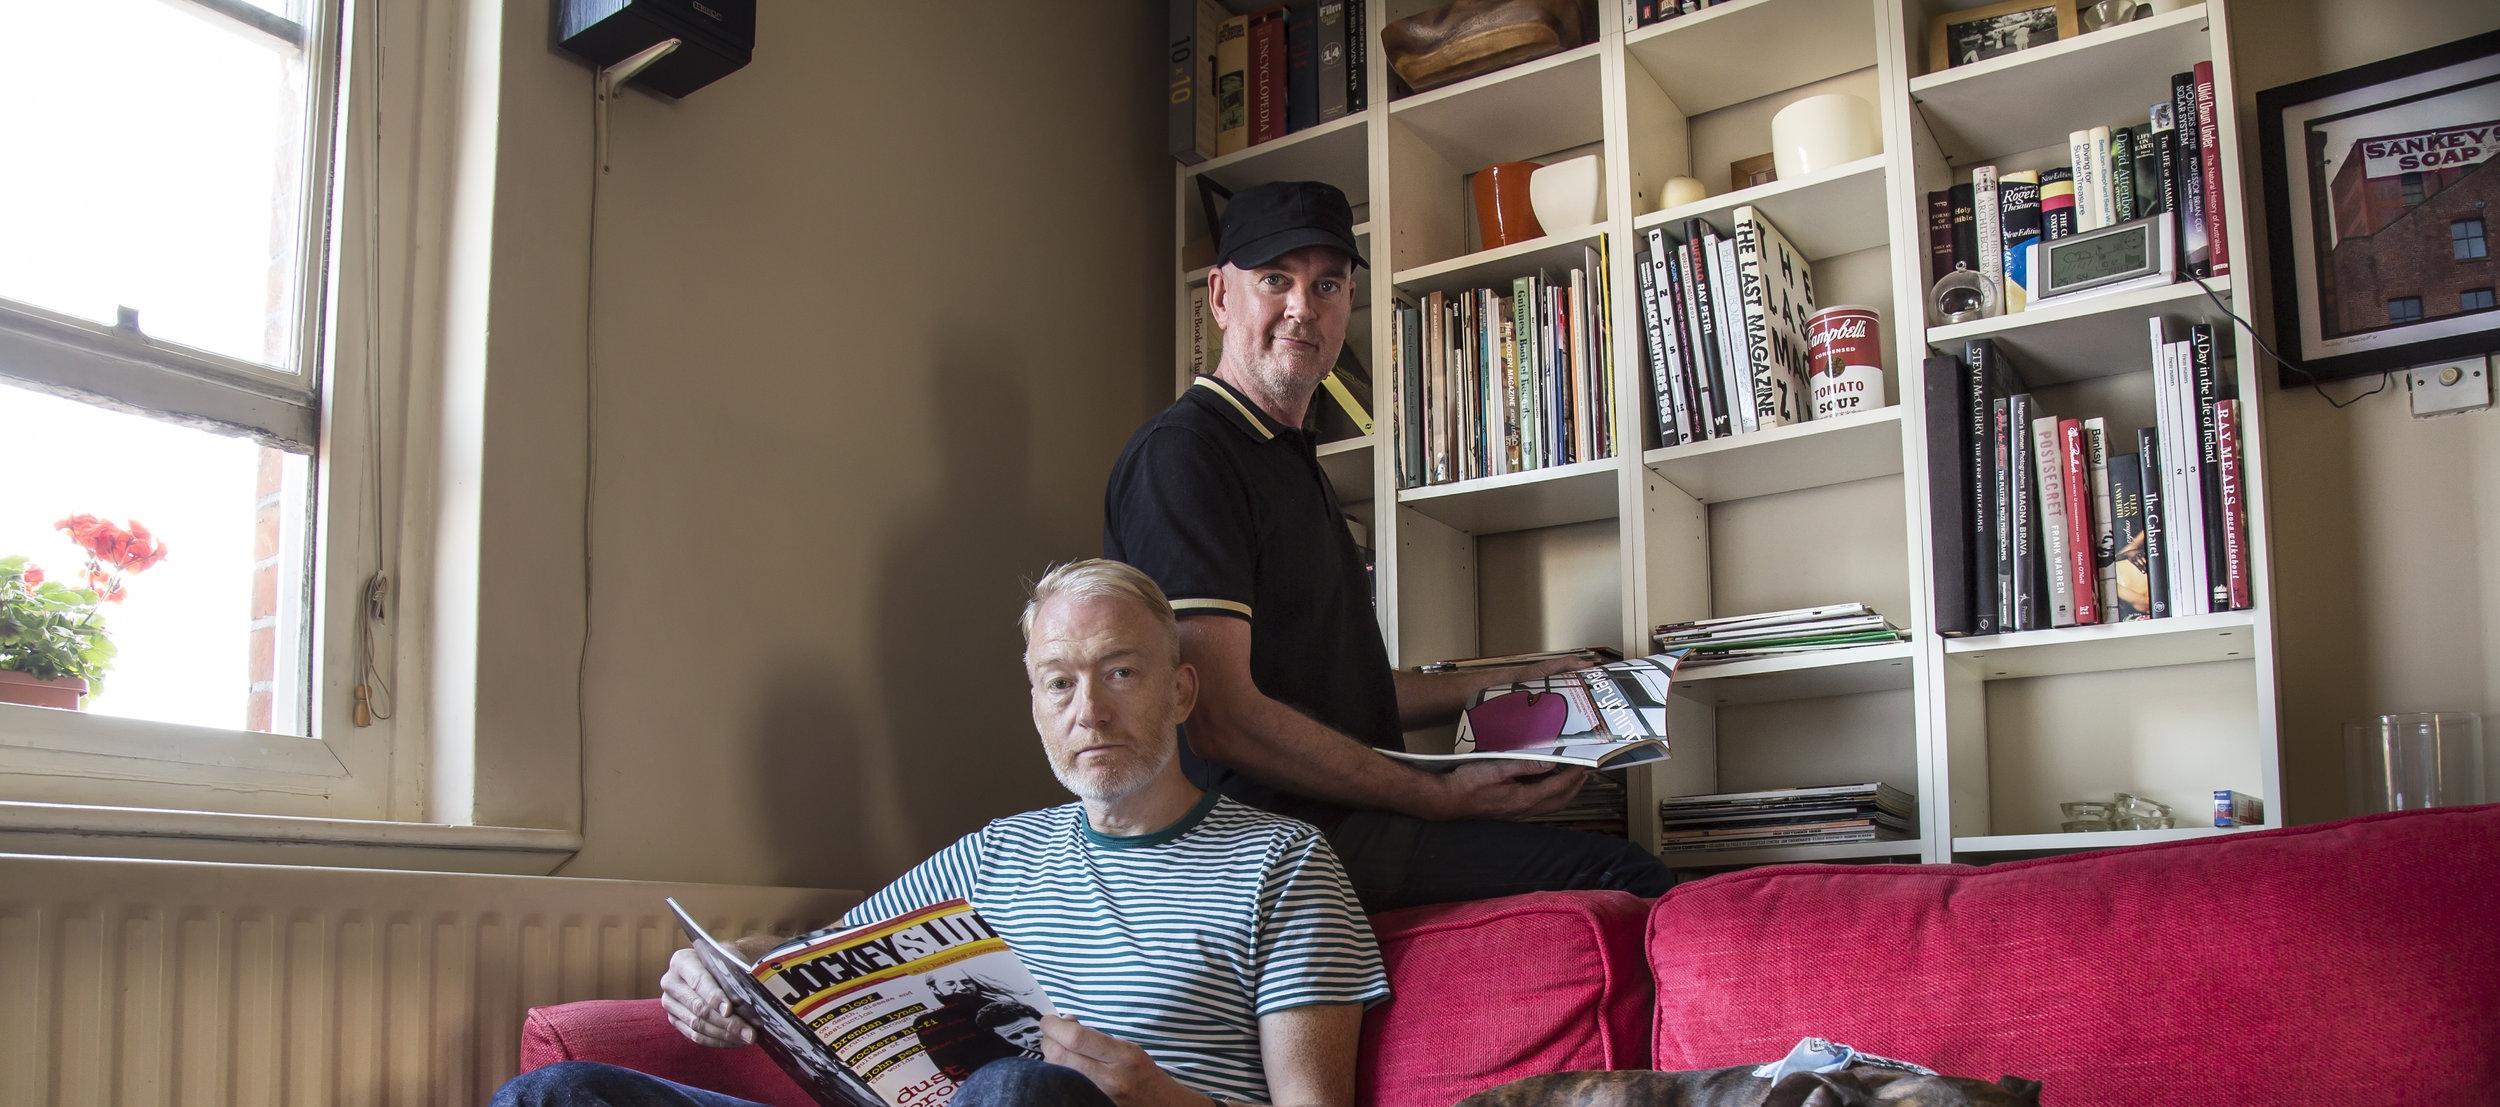 Paul Benney and Johnno Burgess, Jockey Slut. (Photography: Rob Greig)